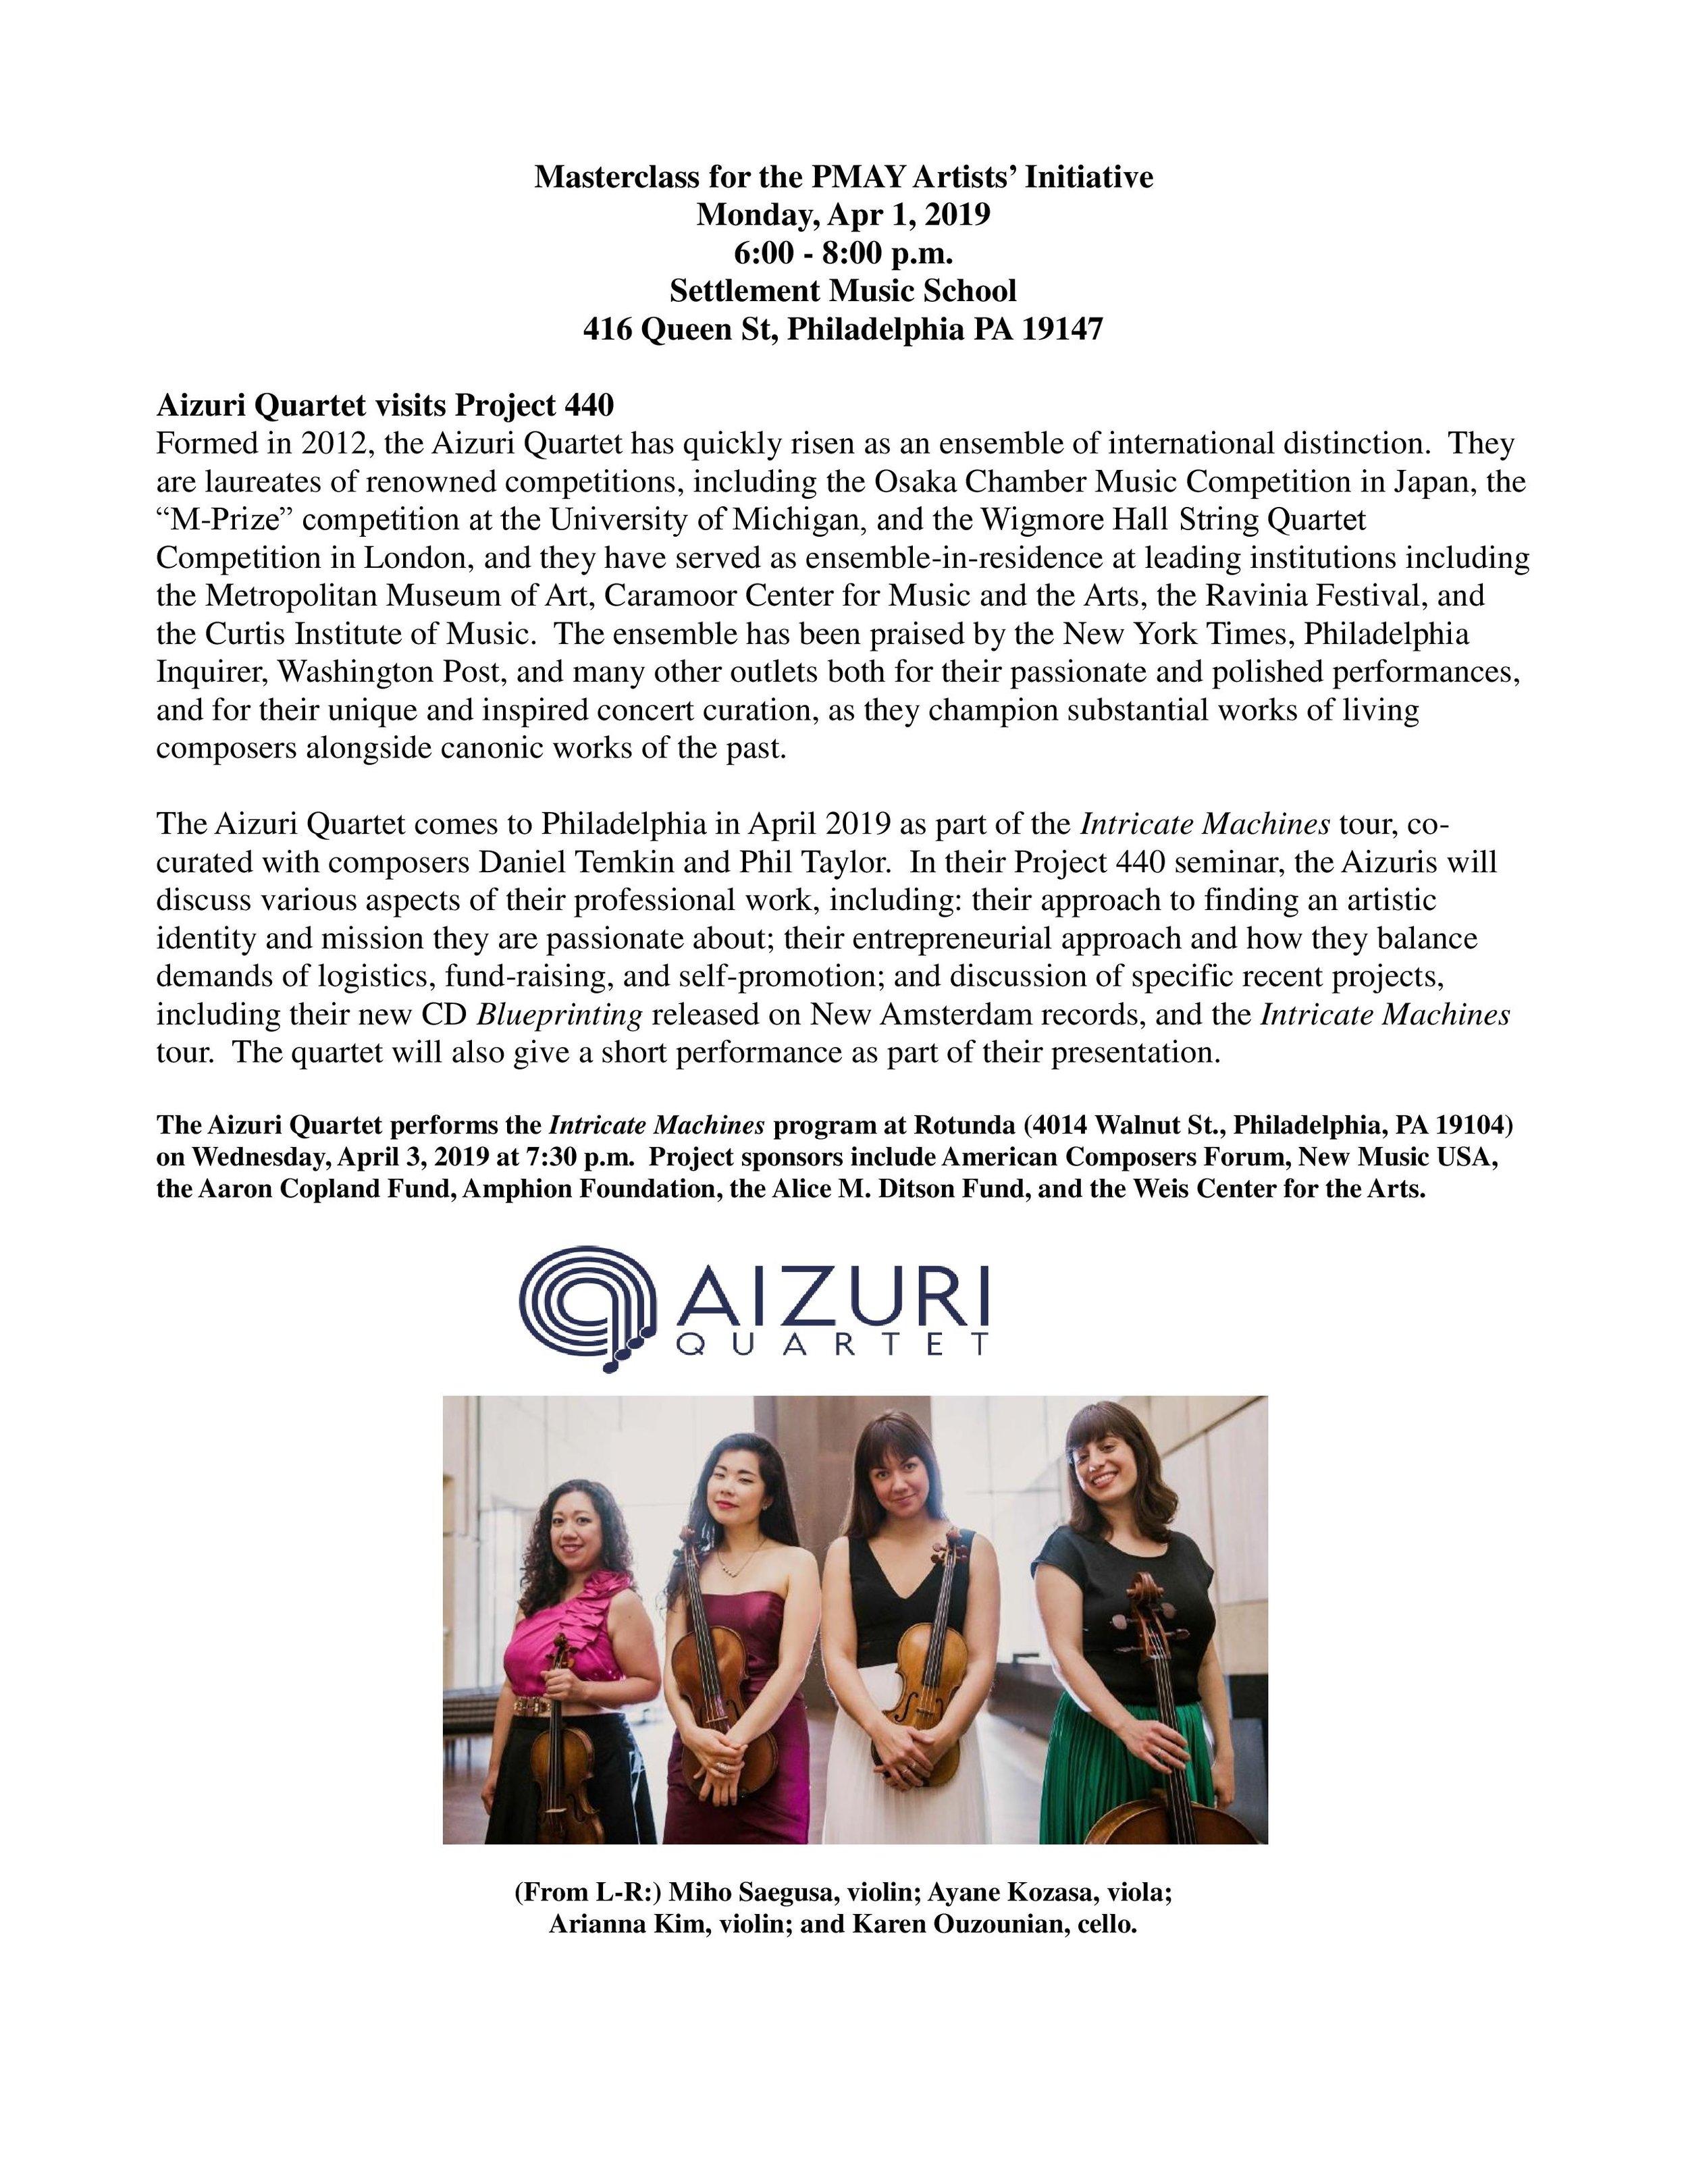 Aizuri Quartet Masterclass April 2019-page-001.jpg